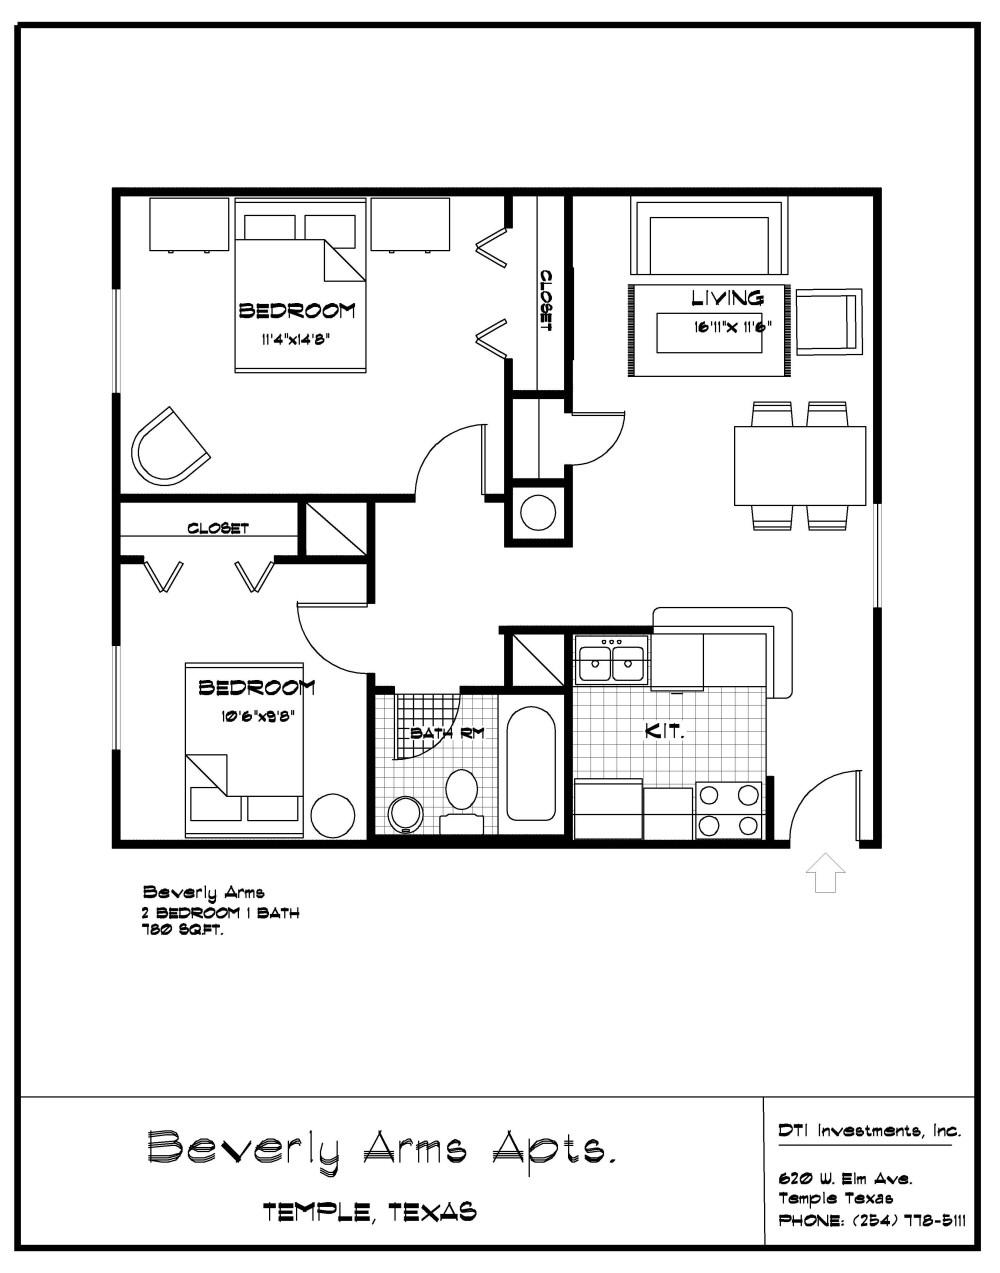 bedroom 1 bathroom floor plan bathroom home plans ideas picture